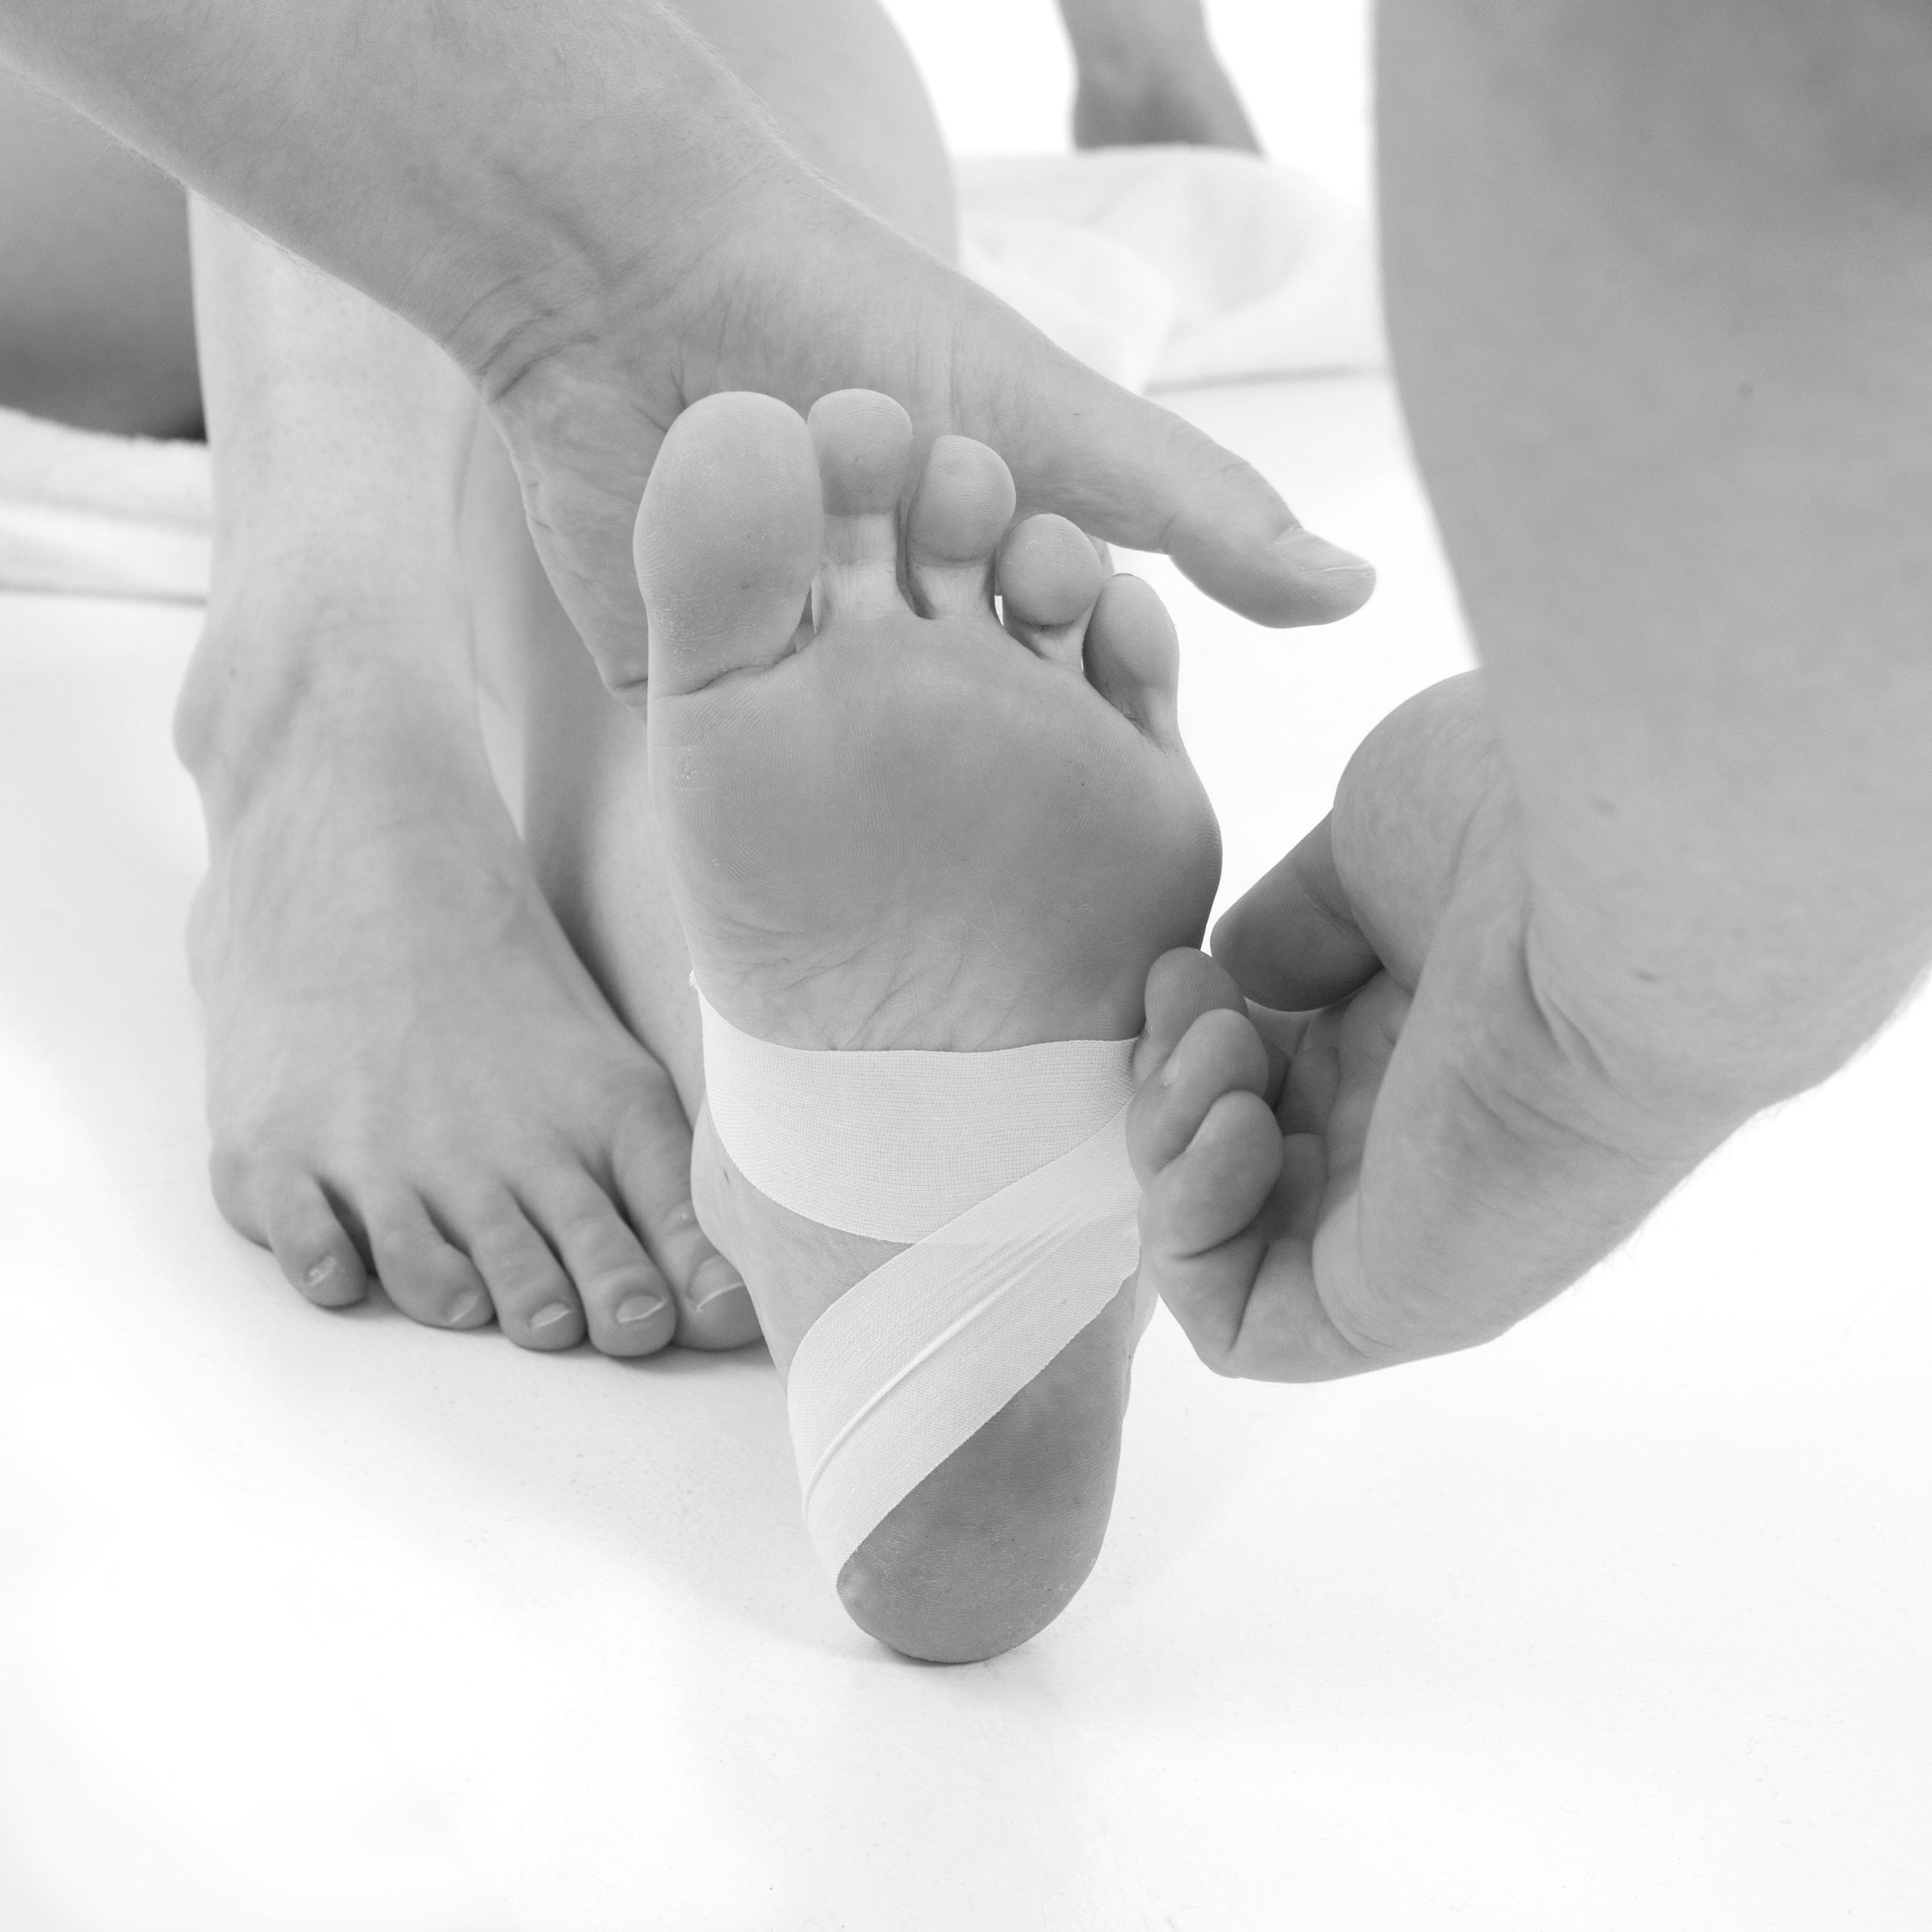 Smerte i ankel og fot